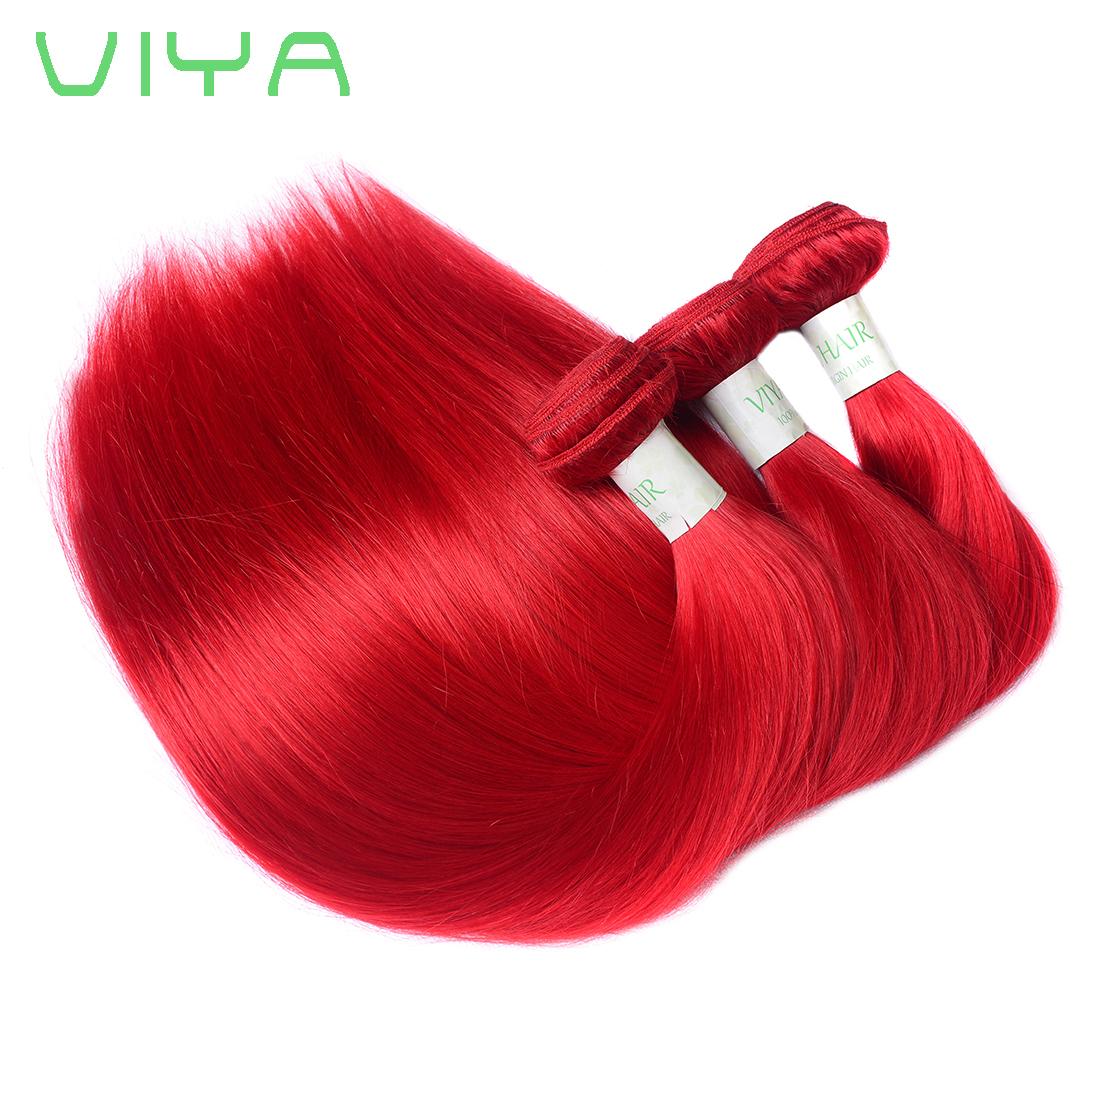 Viya hair products Peruvian Virgin hair Straight hair RED 3 Bundles ...